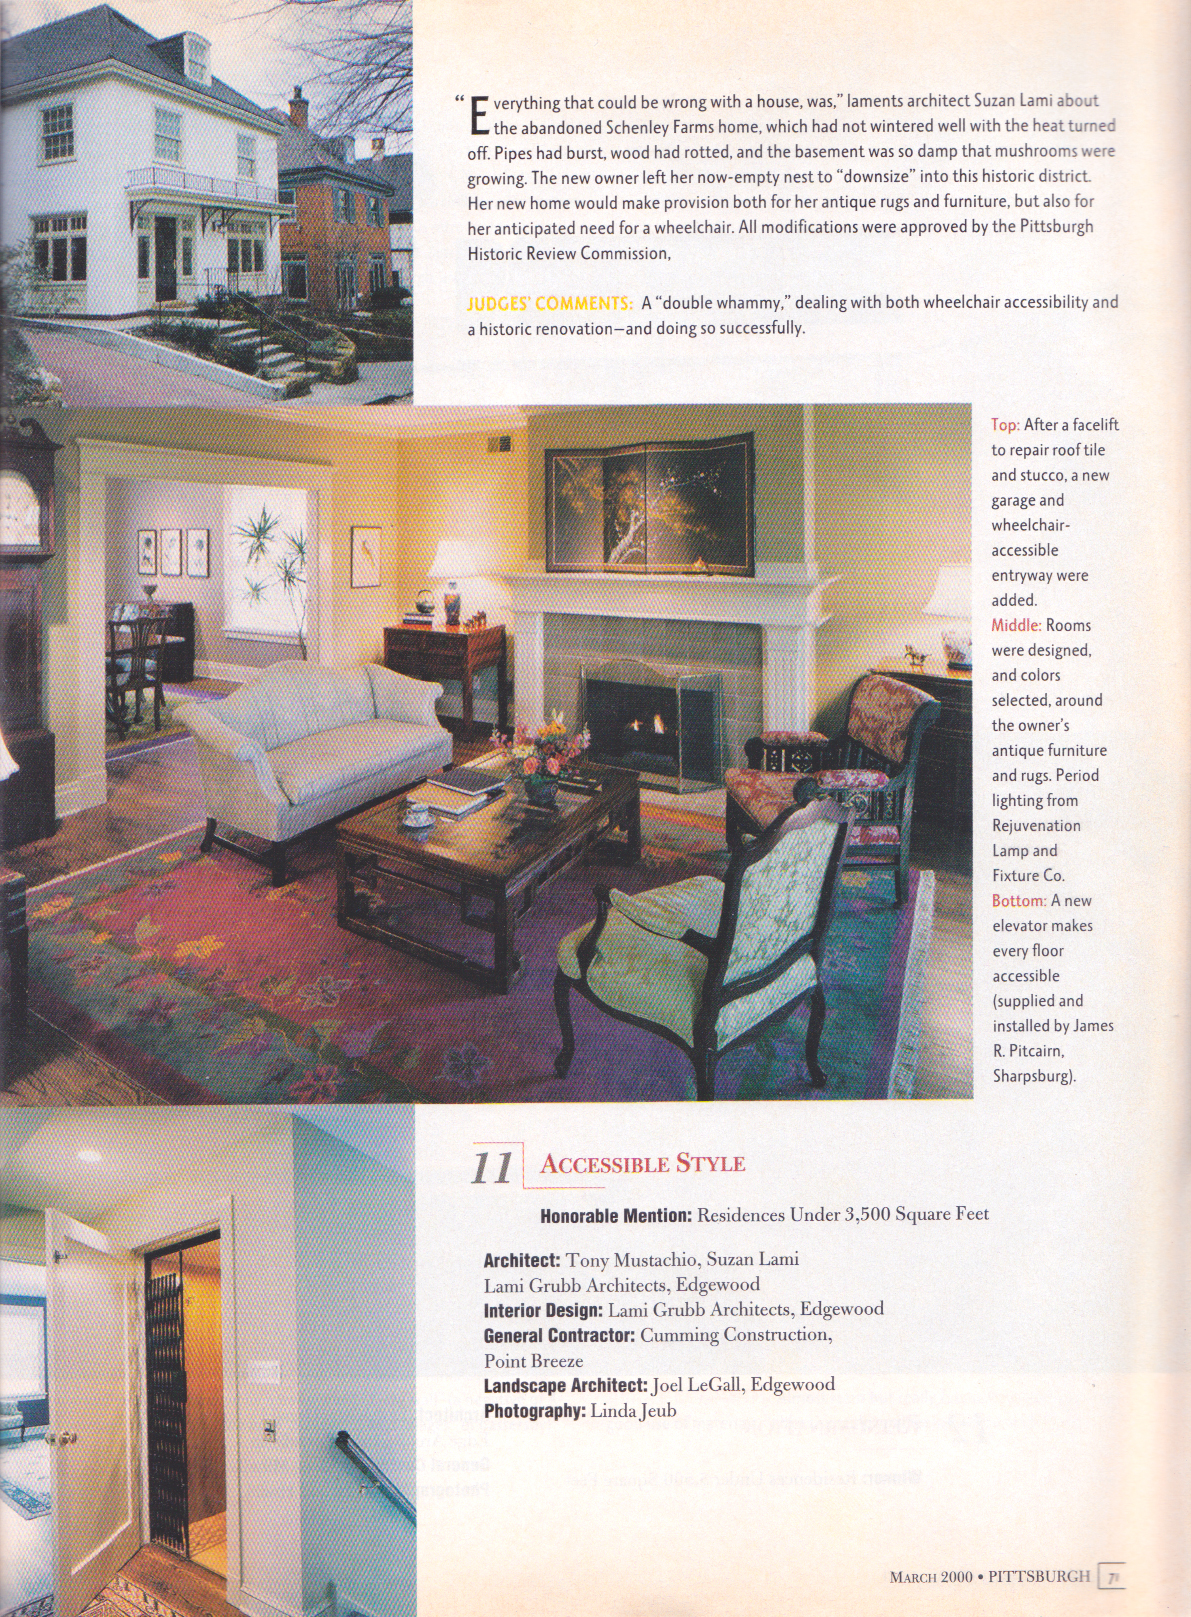 Pittsburgh Magazine, March 2000